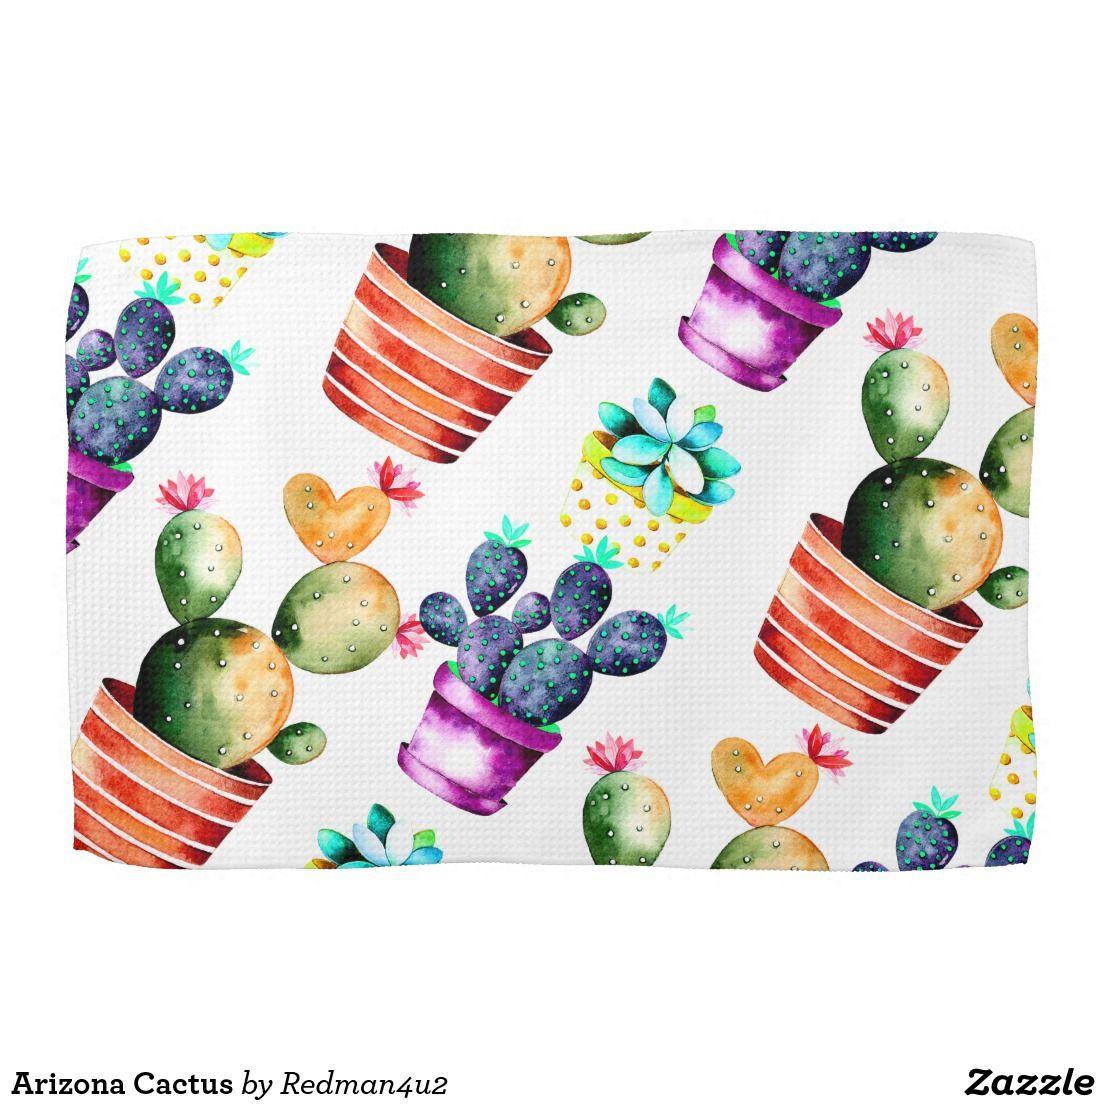 Arizona Cactus Kitchen Towel | Zazzle.com #arizonacactus